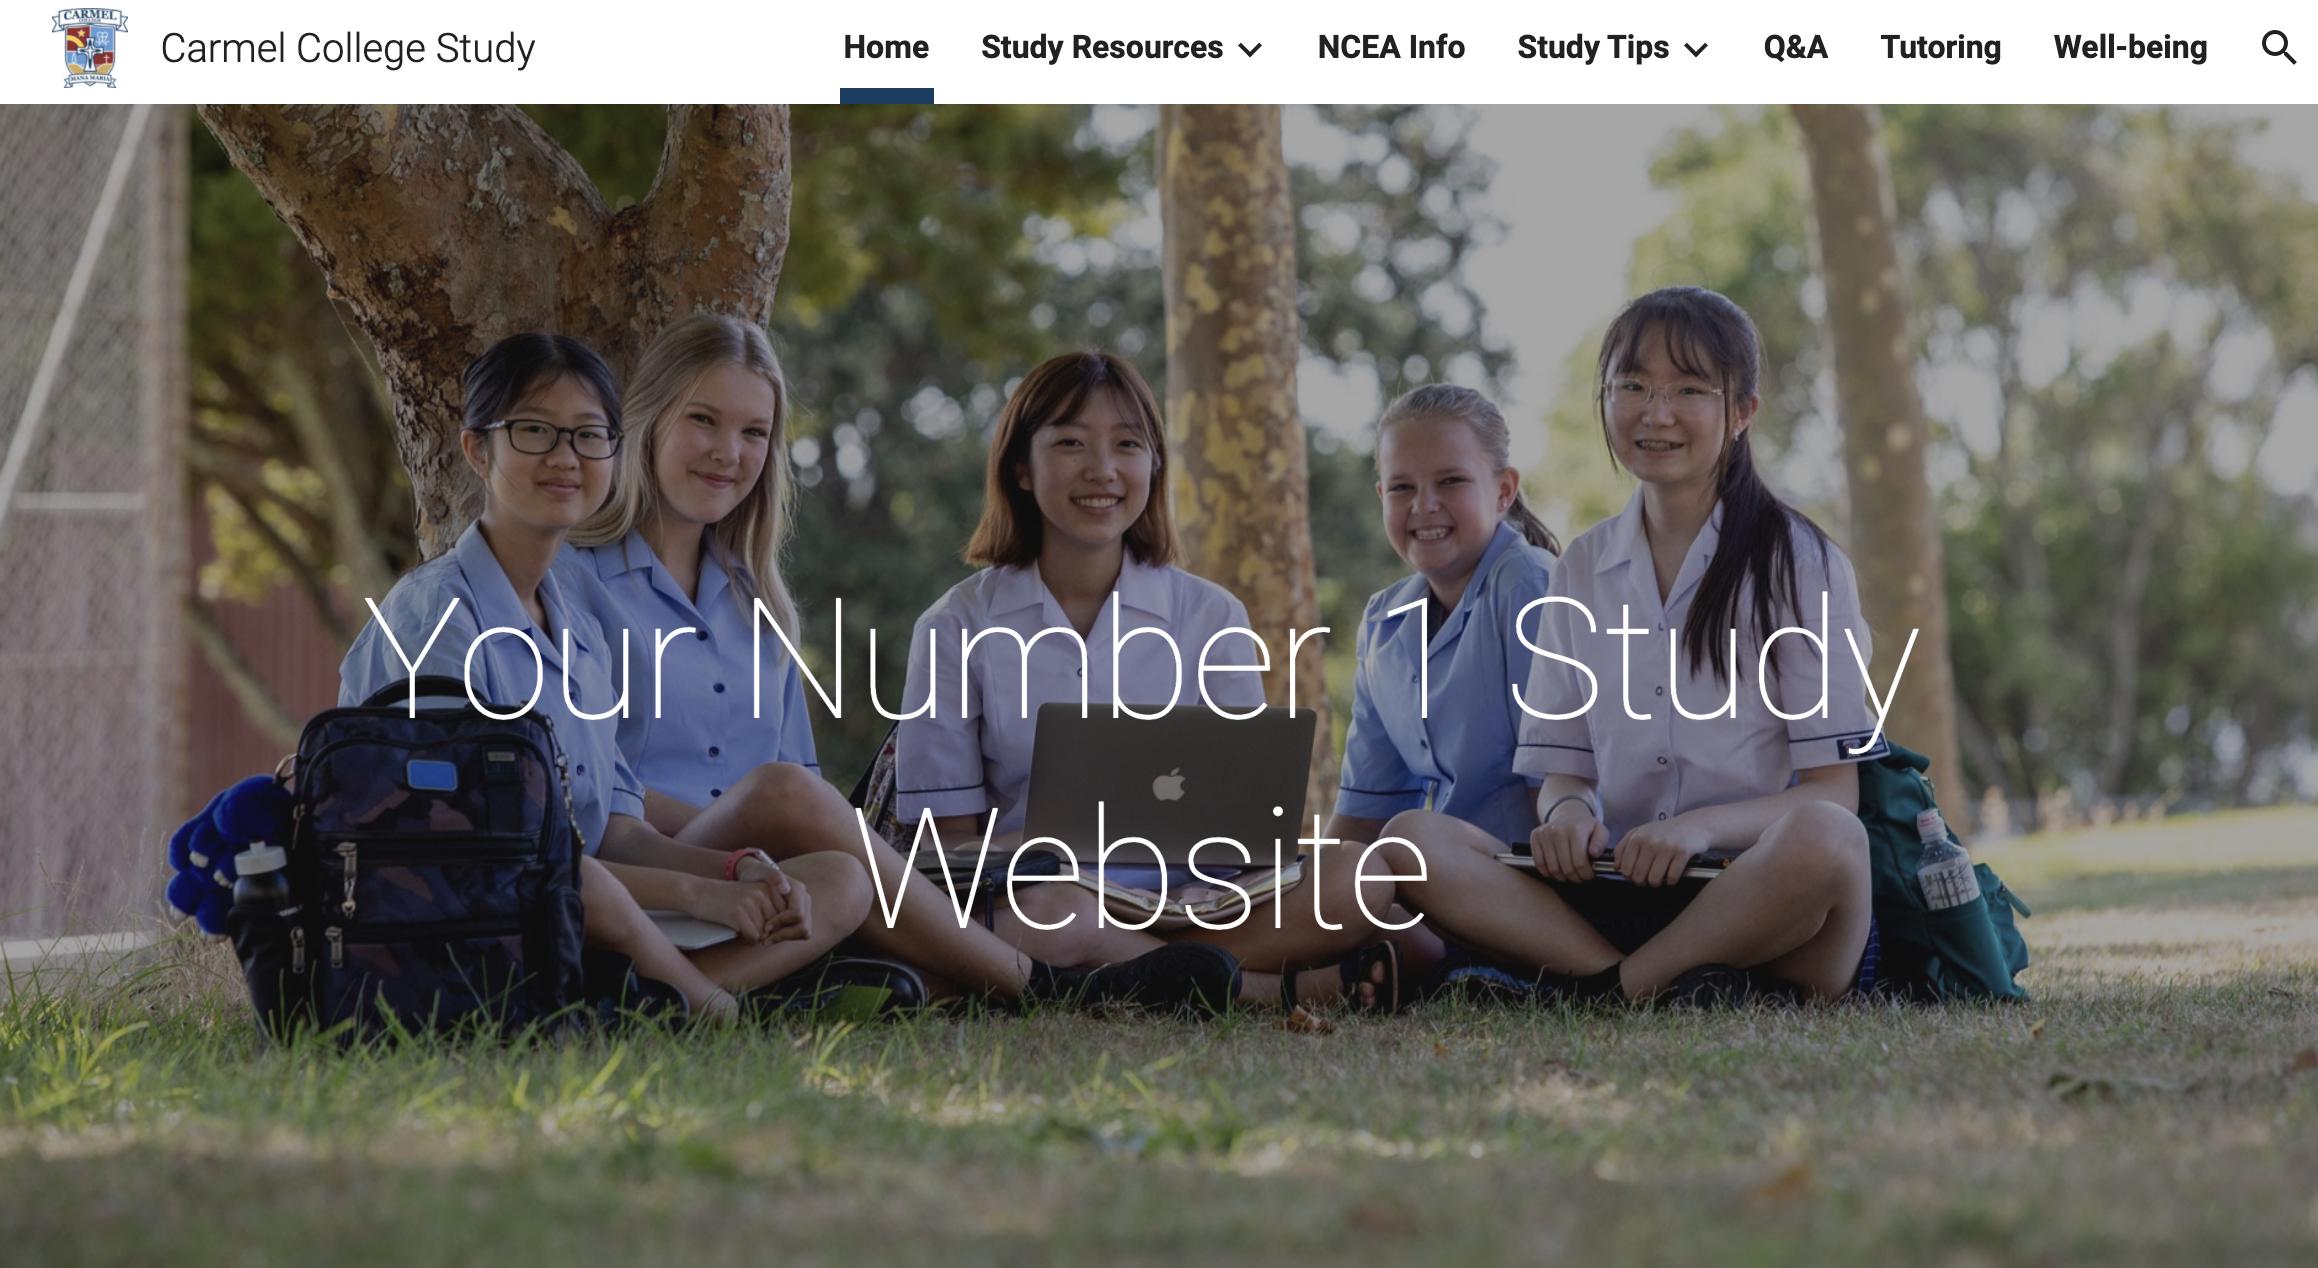 Visit the Carmel Study Website